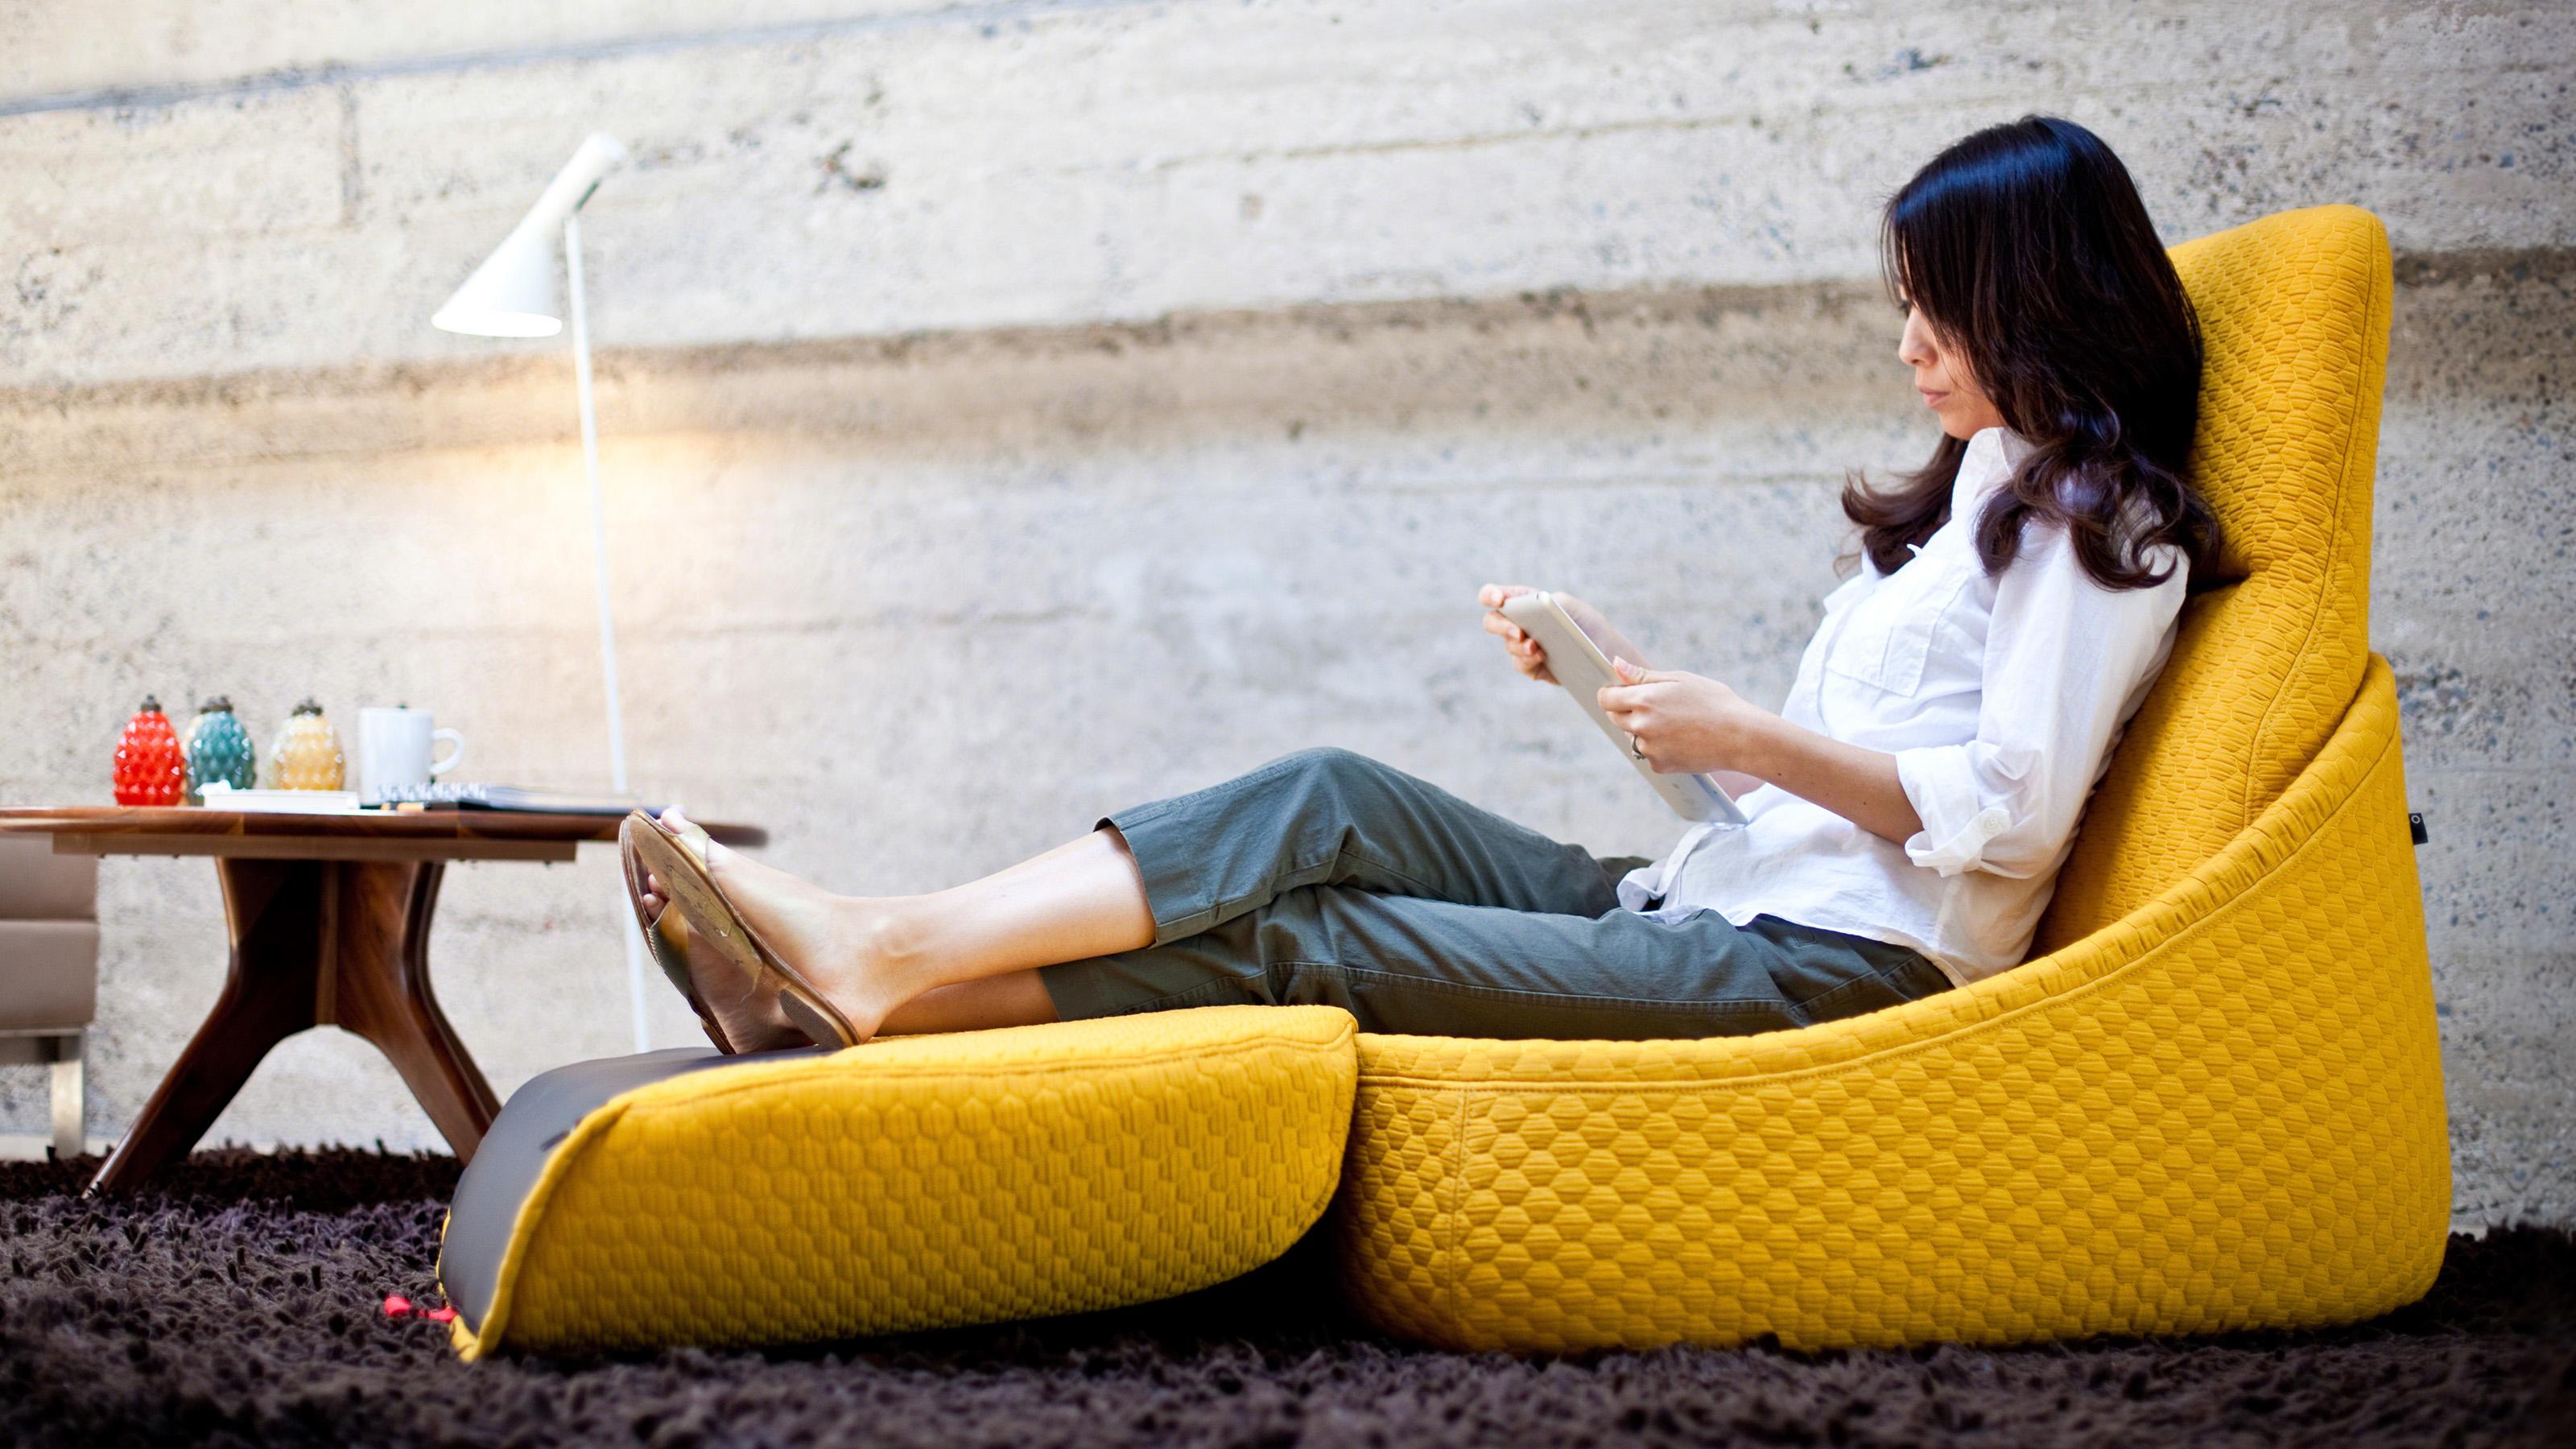 coalesse hosu work lounge chairs seating steelcase. Black Bedroom Furniture Sets. Home Design Ideas